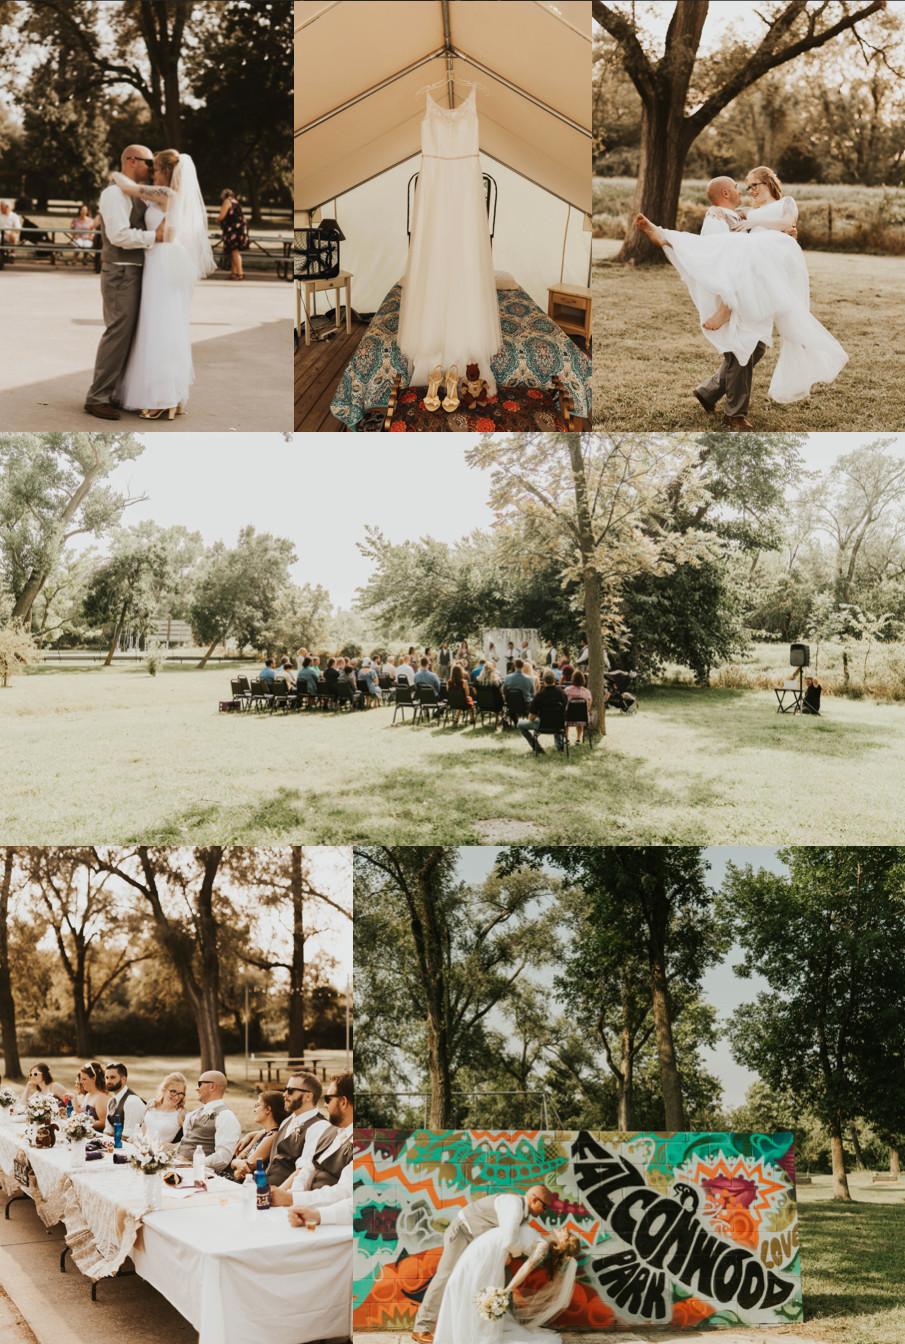 Best Wedding Venues in Omaha Falconwood Park